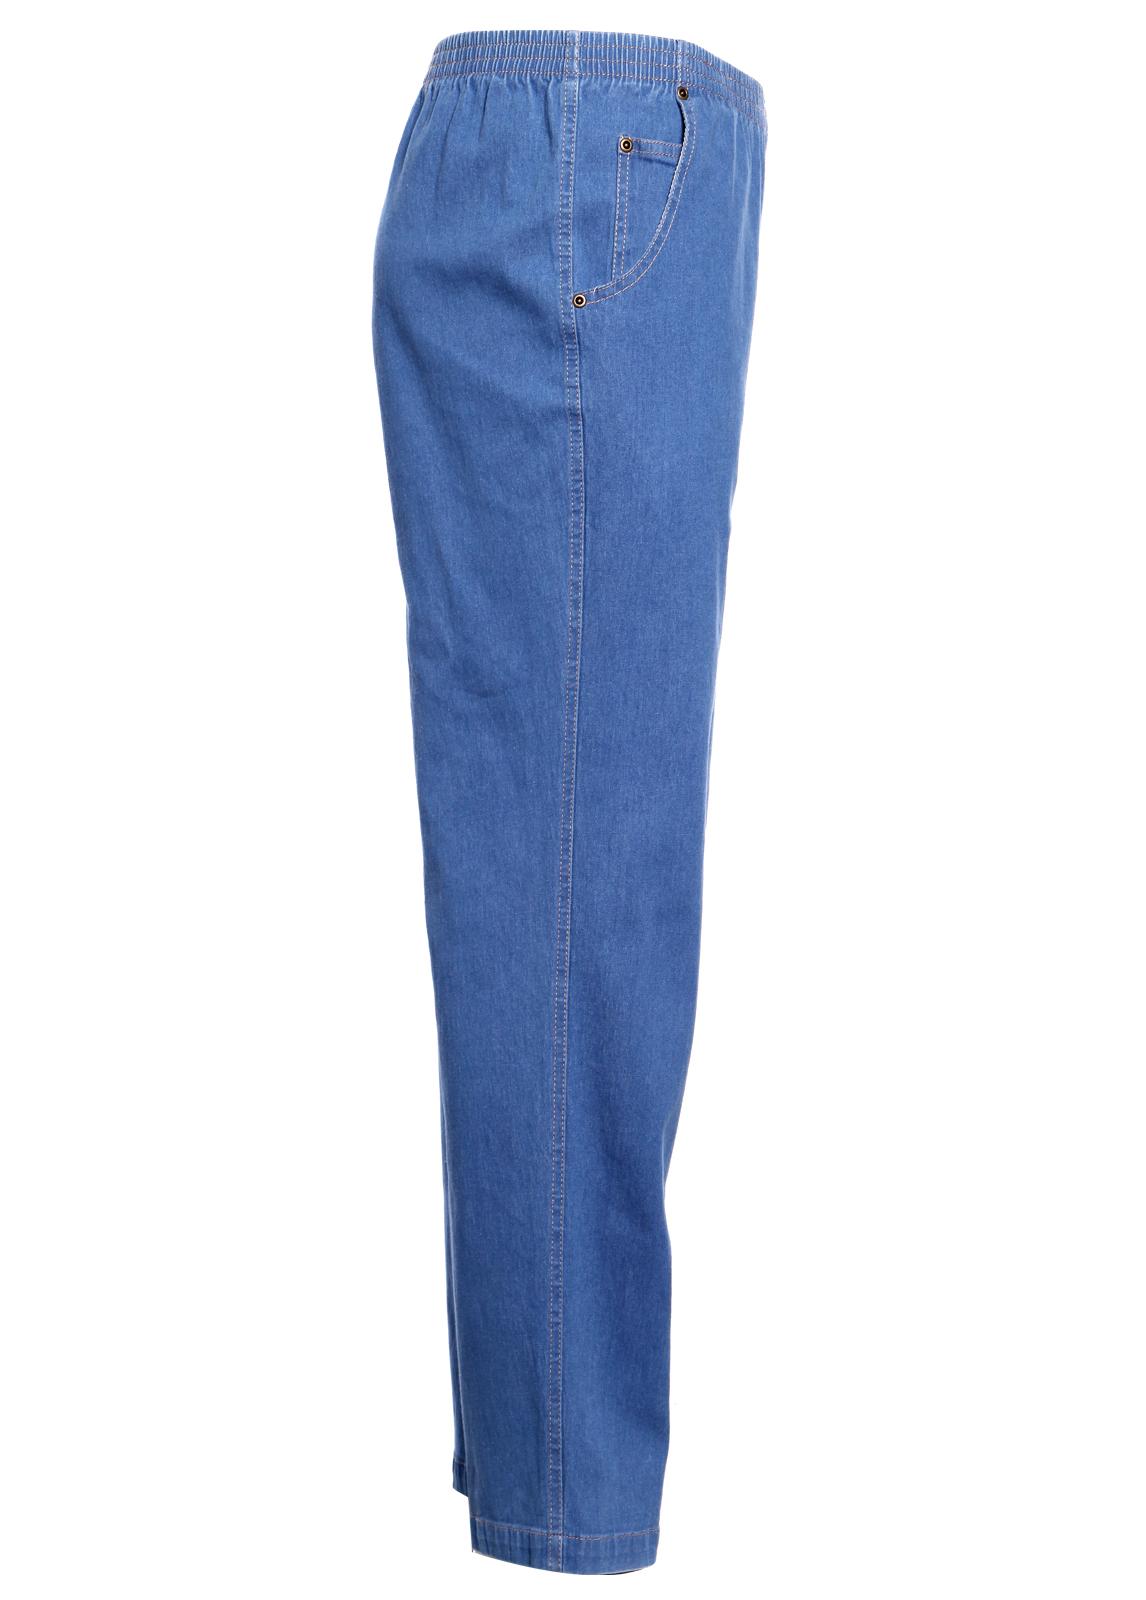 Koret Women Elastic Waist Relax Denim Jeans Pencil ... - photo#18